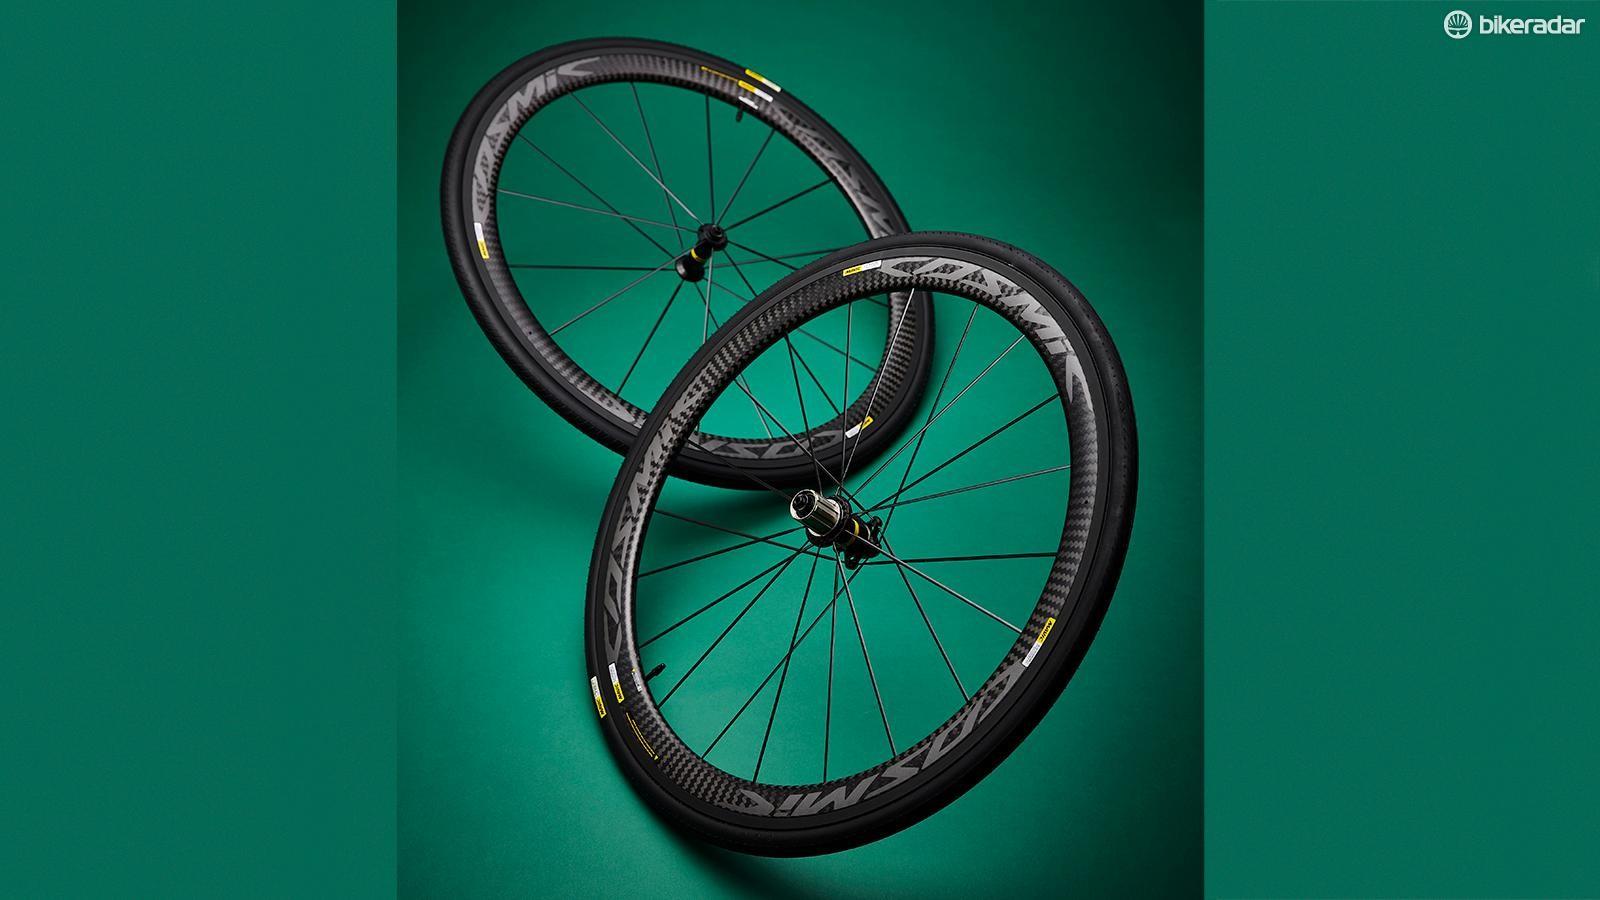 Mavic Cosmic Carbon Pro Exalith wheels